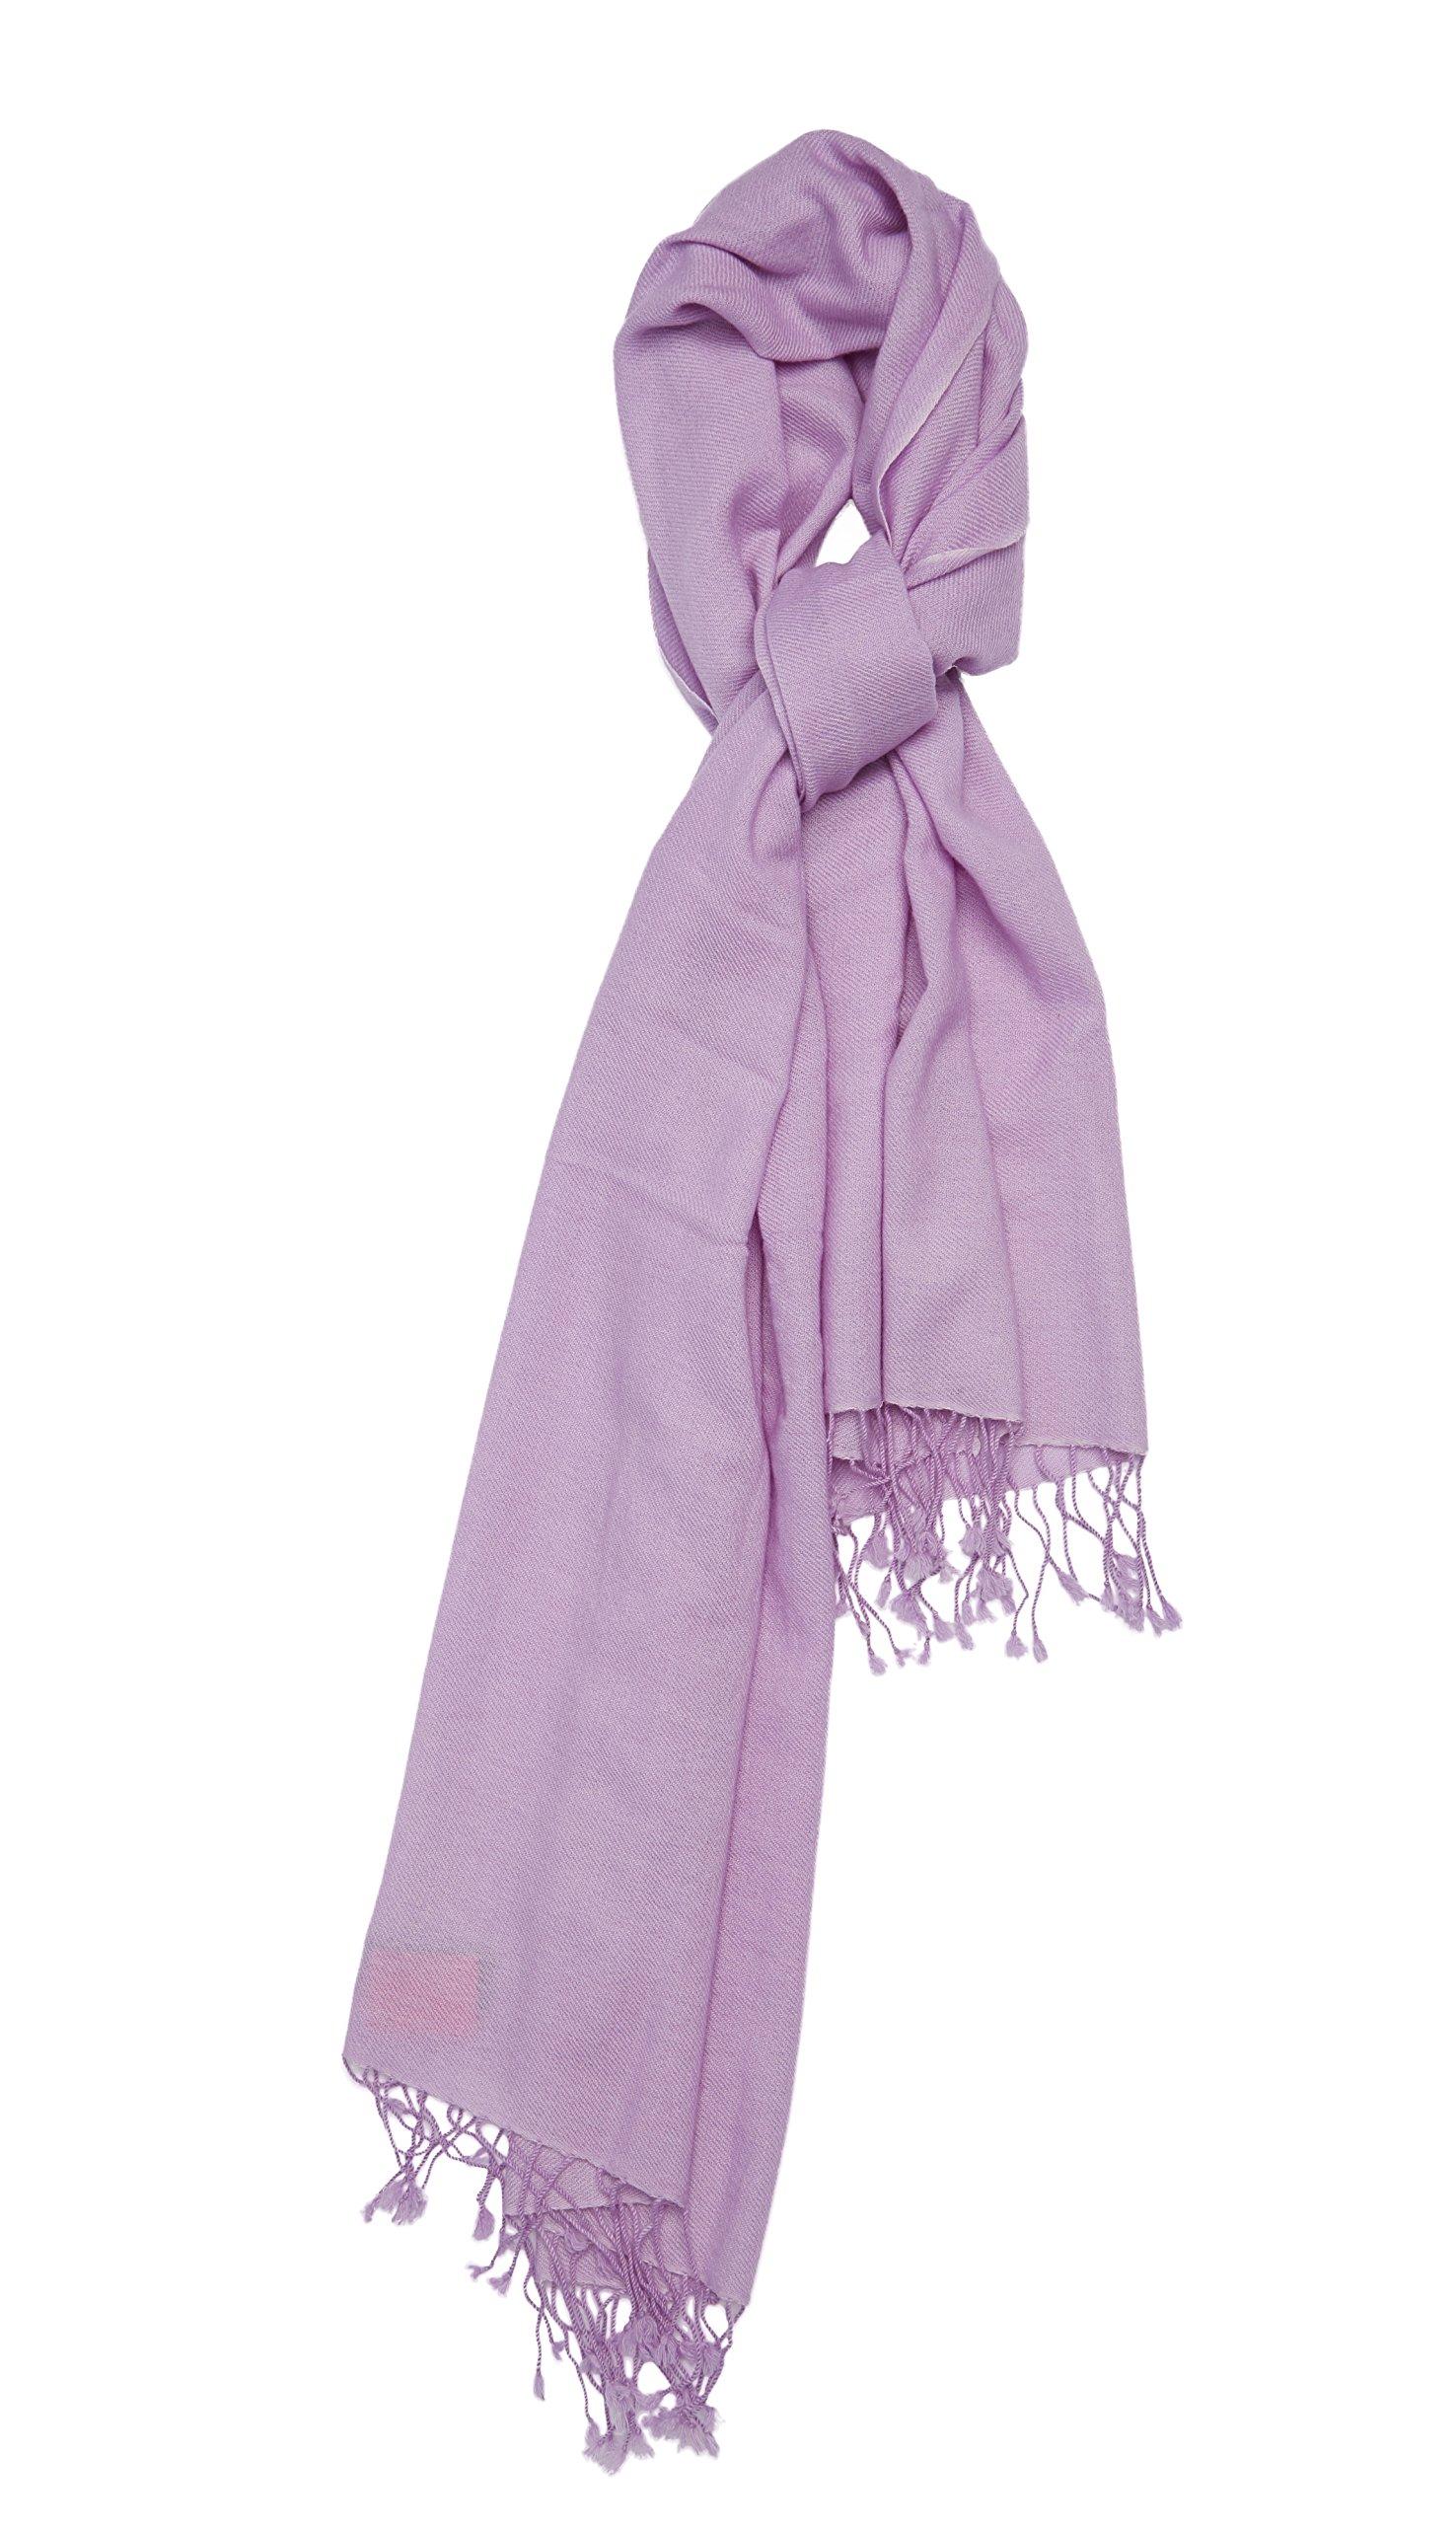 Pure Cashmere Shawl (Faded Lilac)